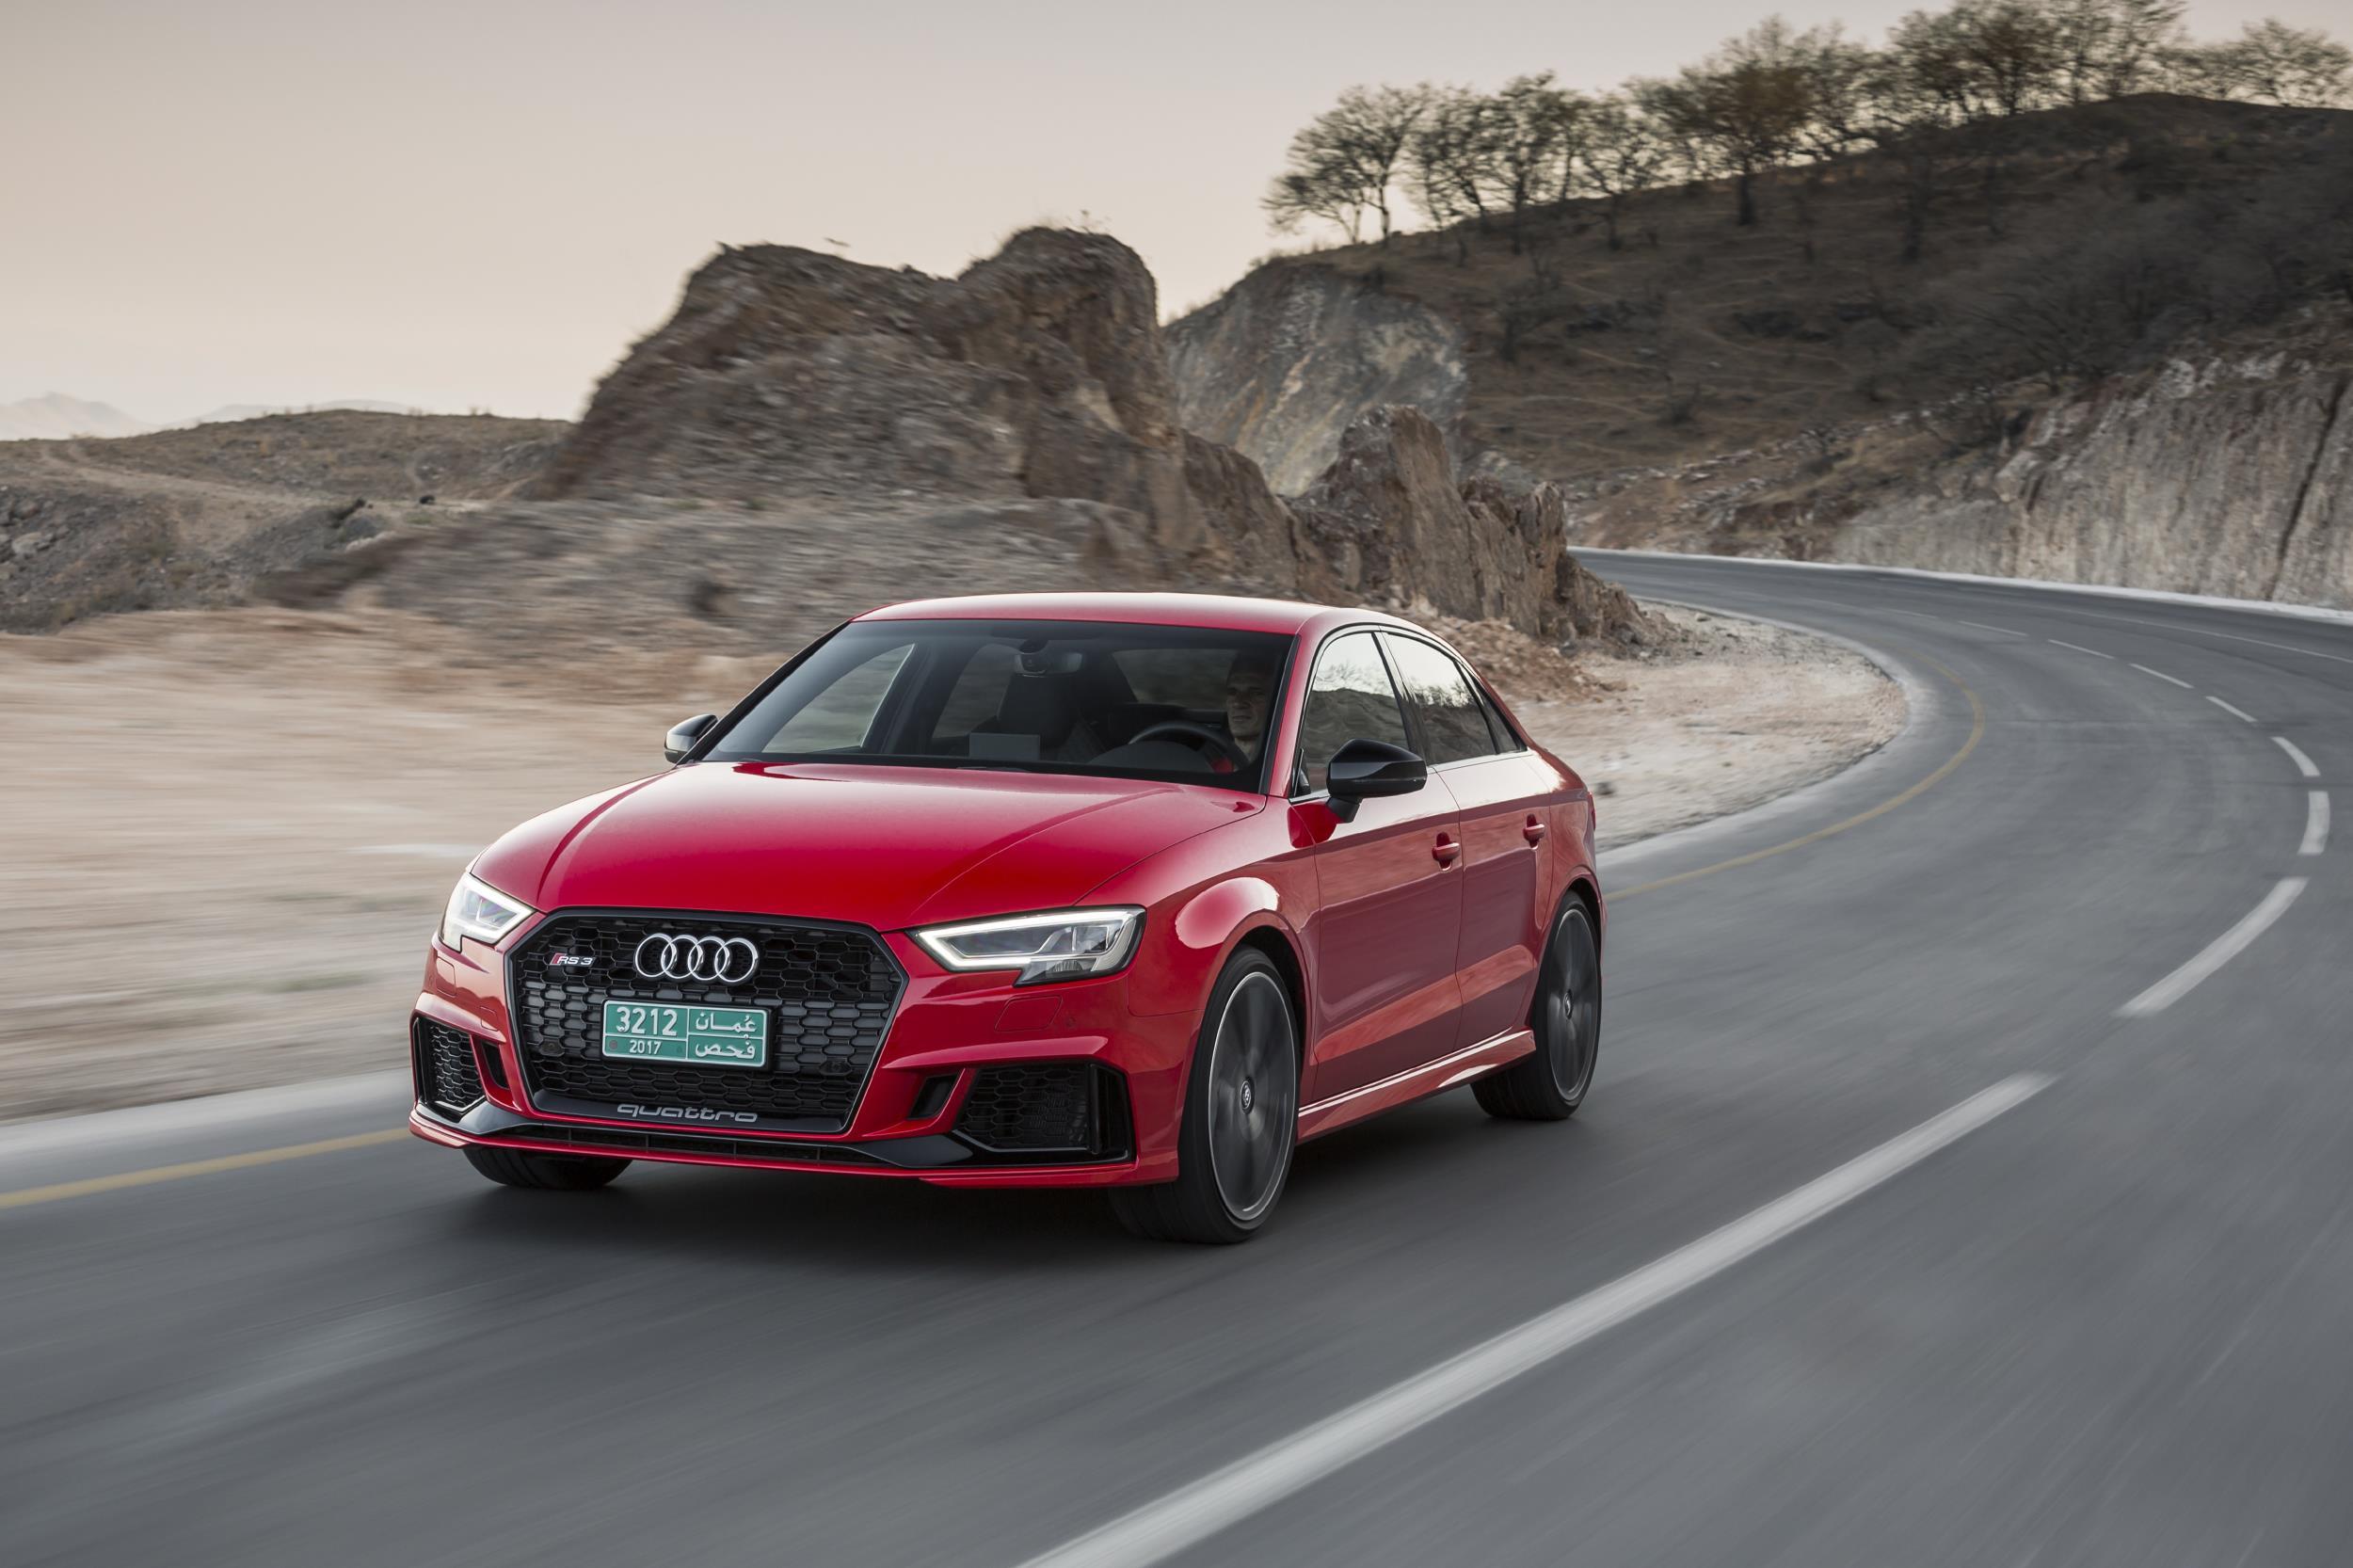 Audi Confirms U.S. Debut Of 2018 RS 3 Sedan At 2017 NYIAS - autoevolution